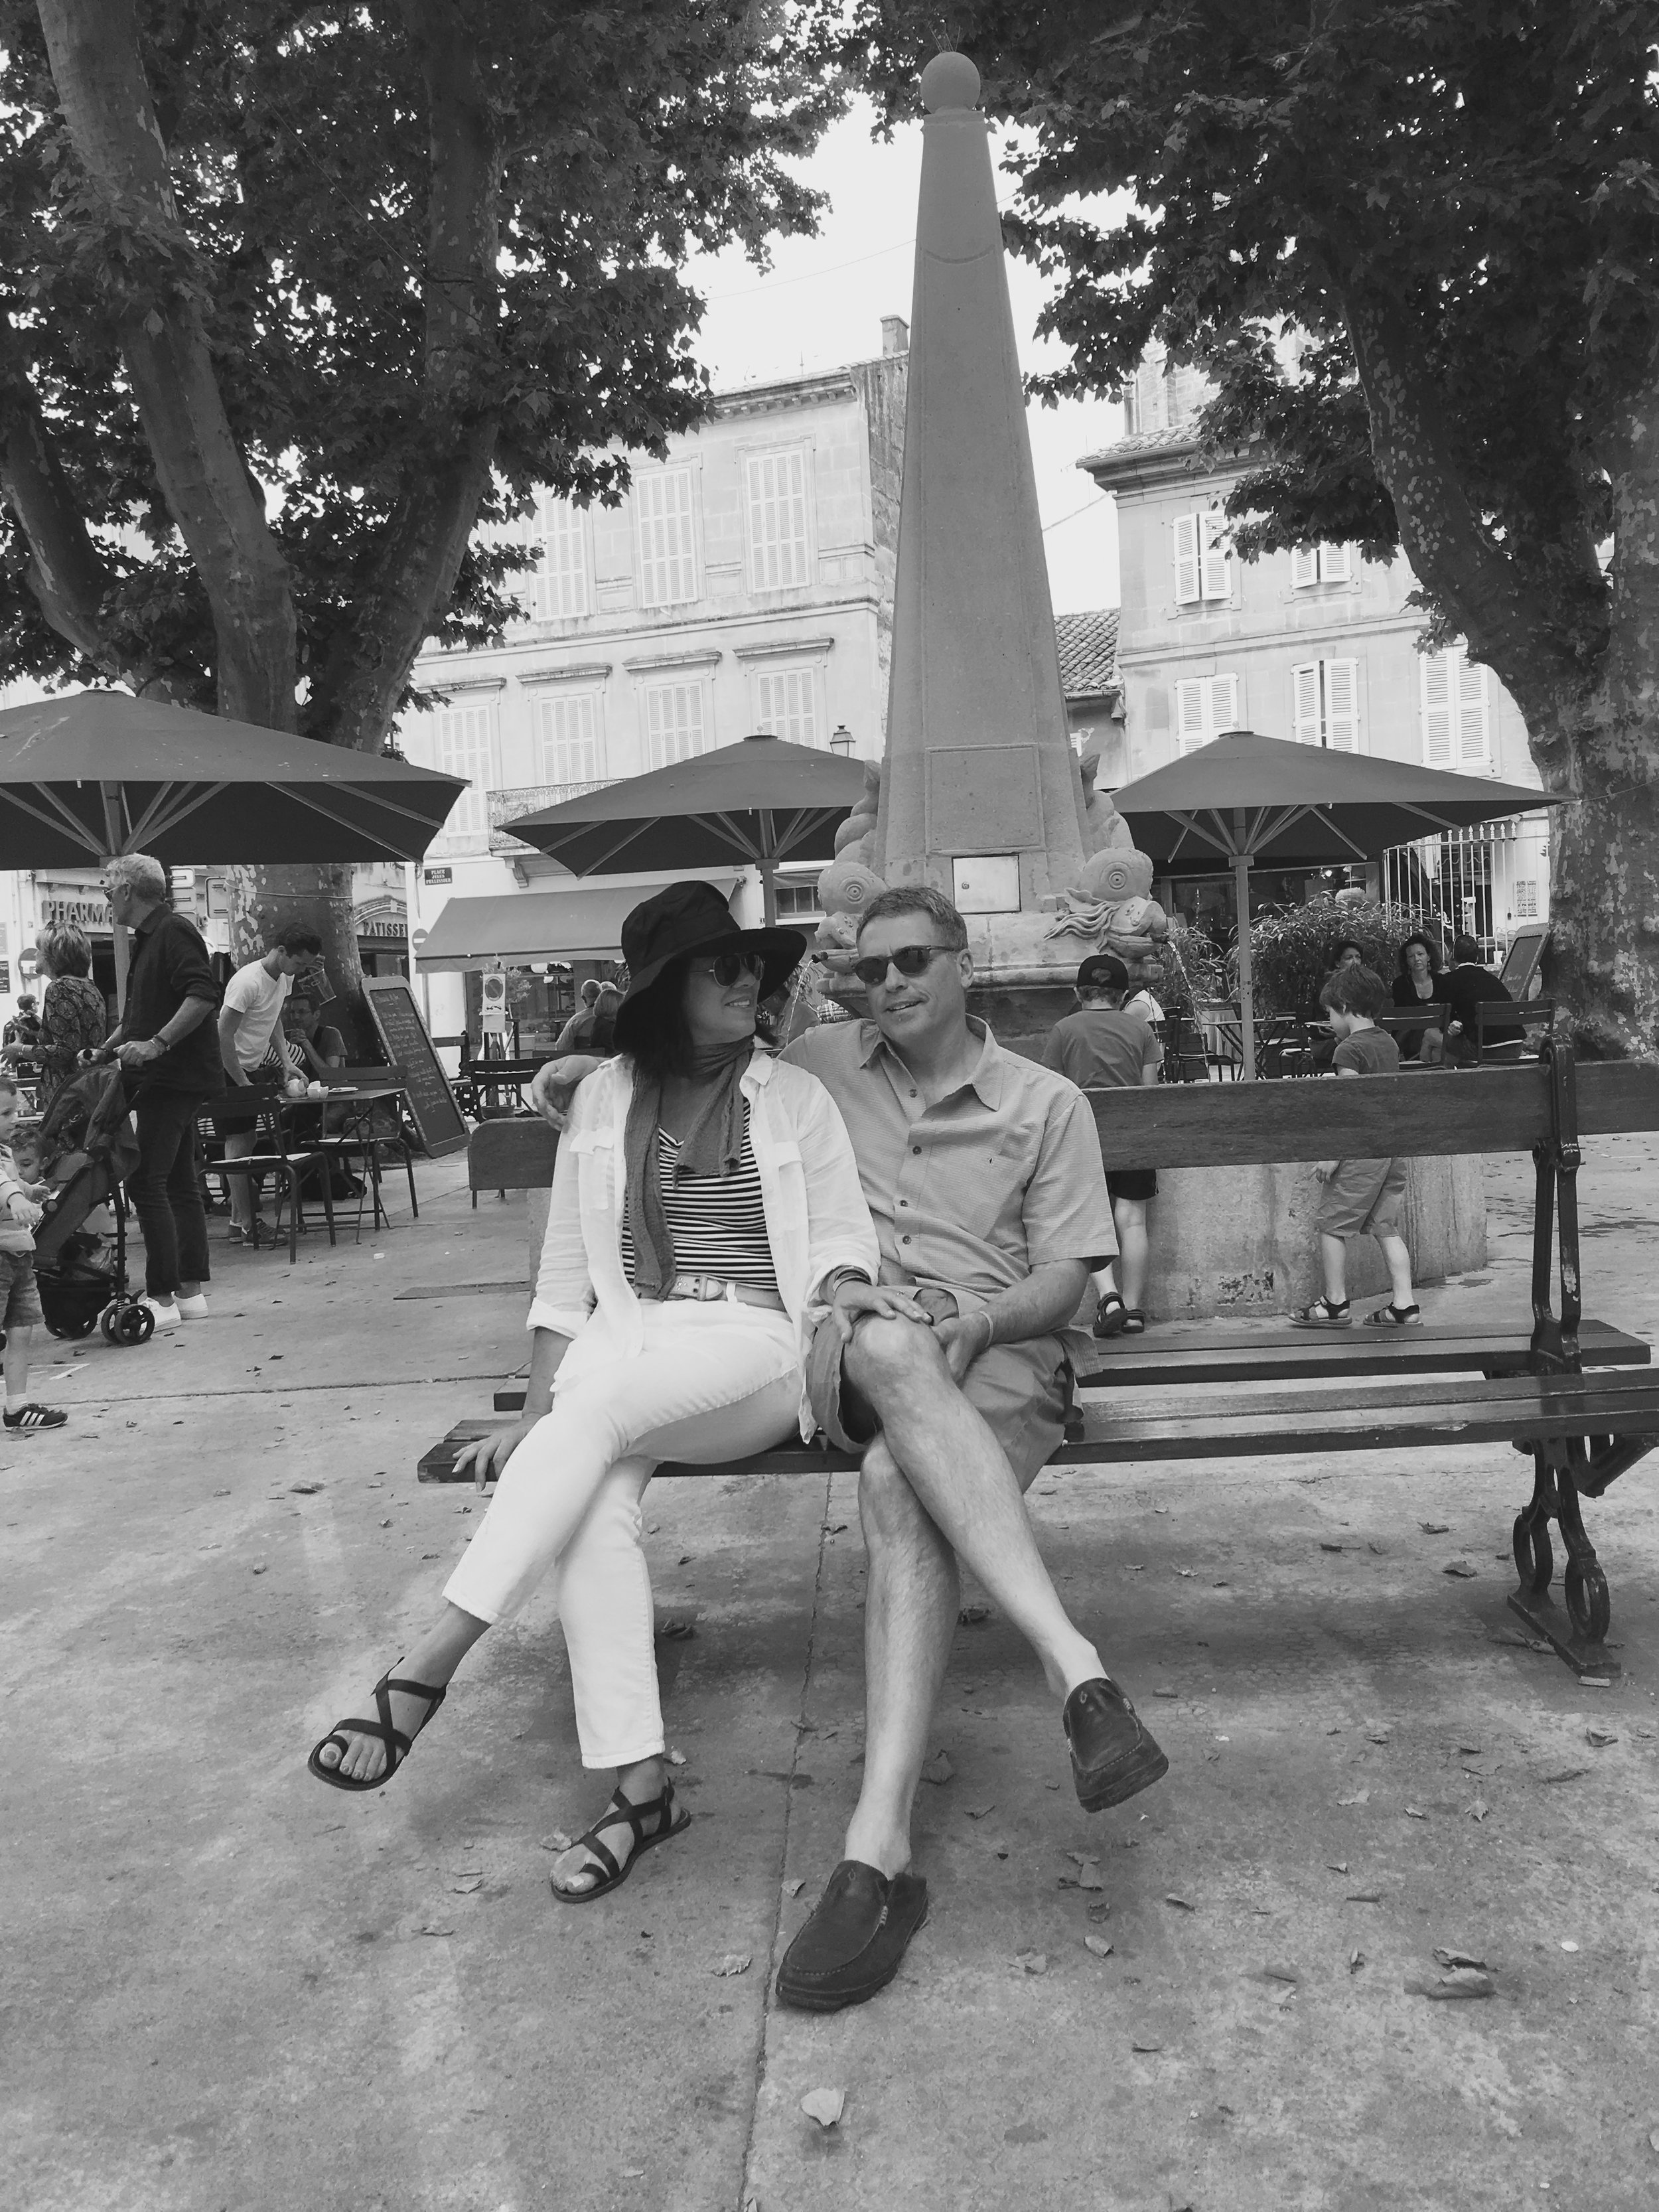 st. remy de provence, france - summer 2016